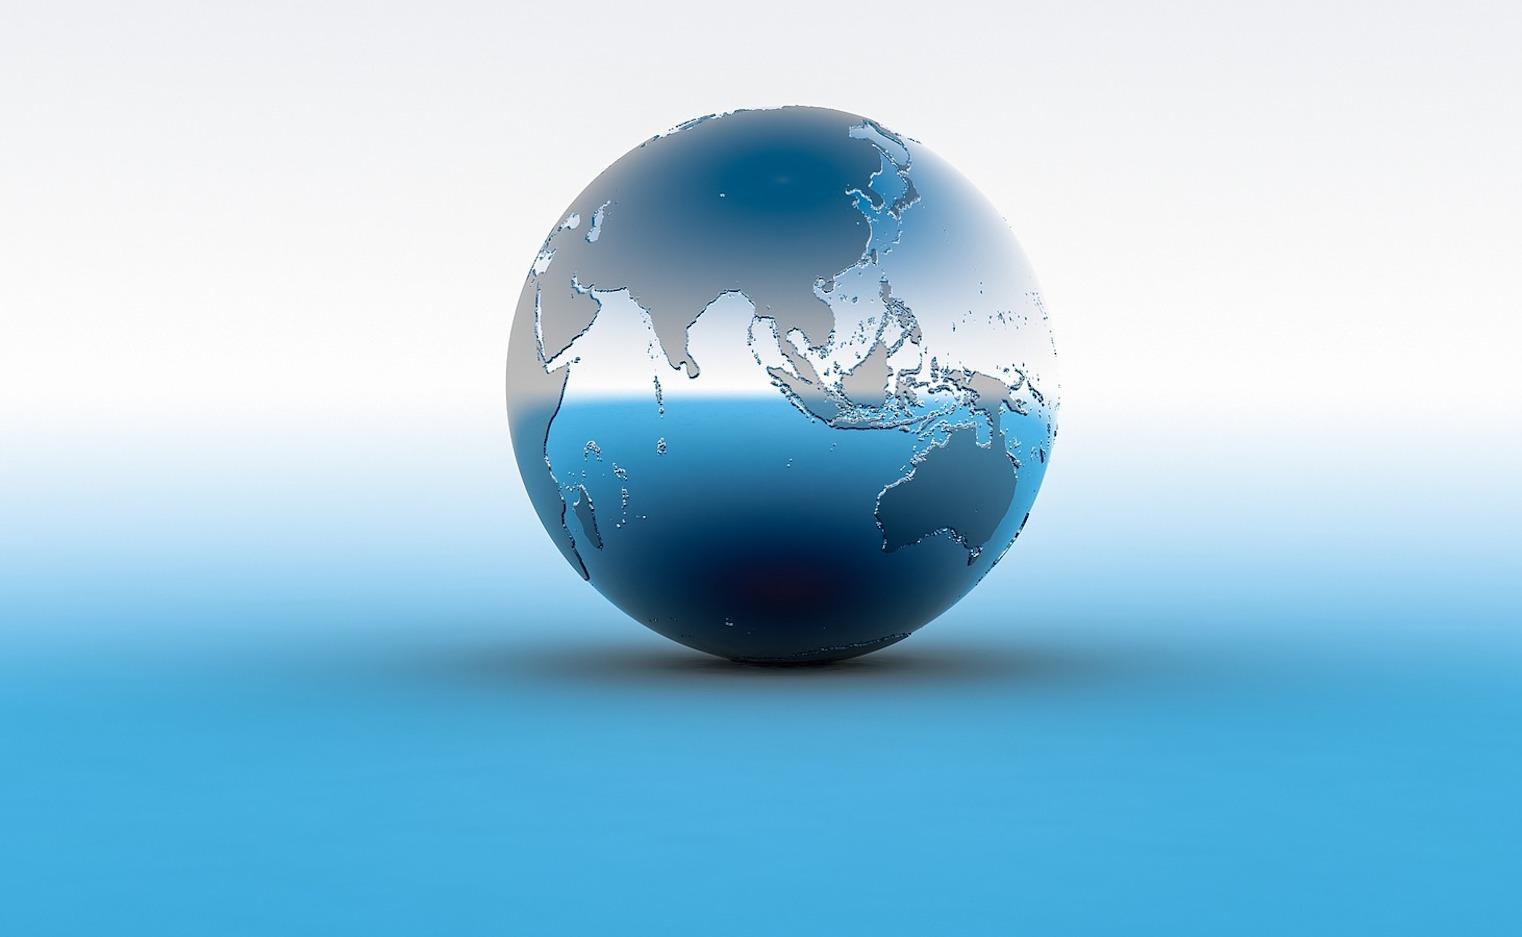 Teal Around The World 2021